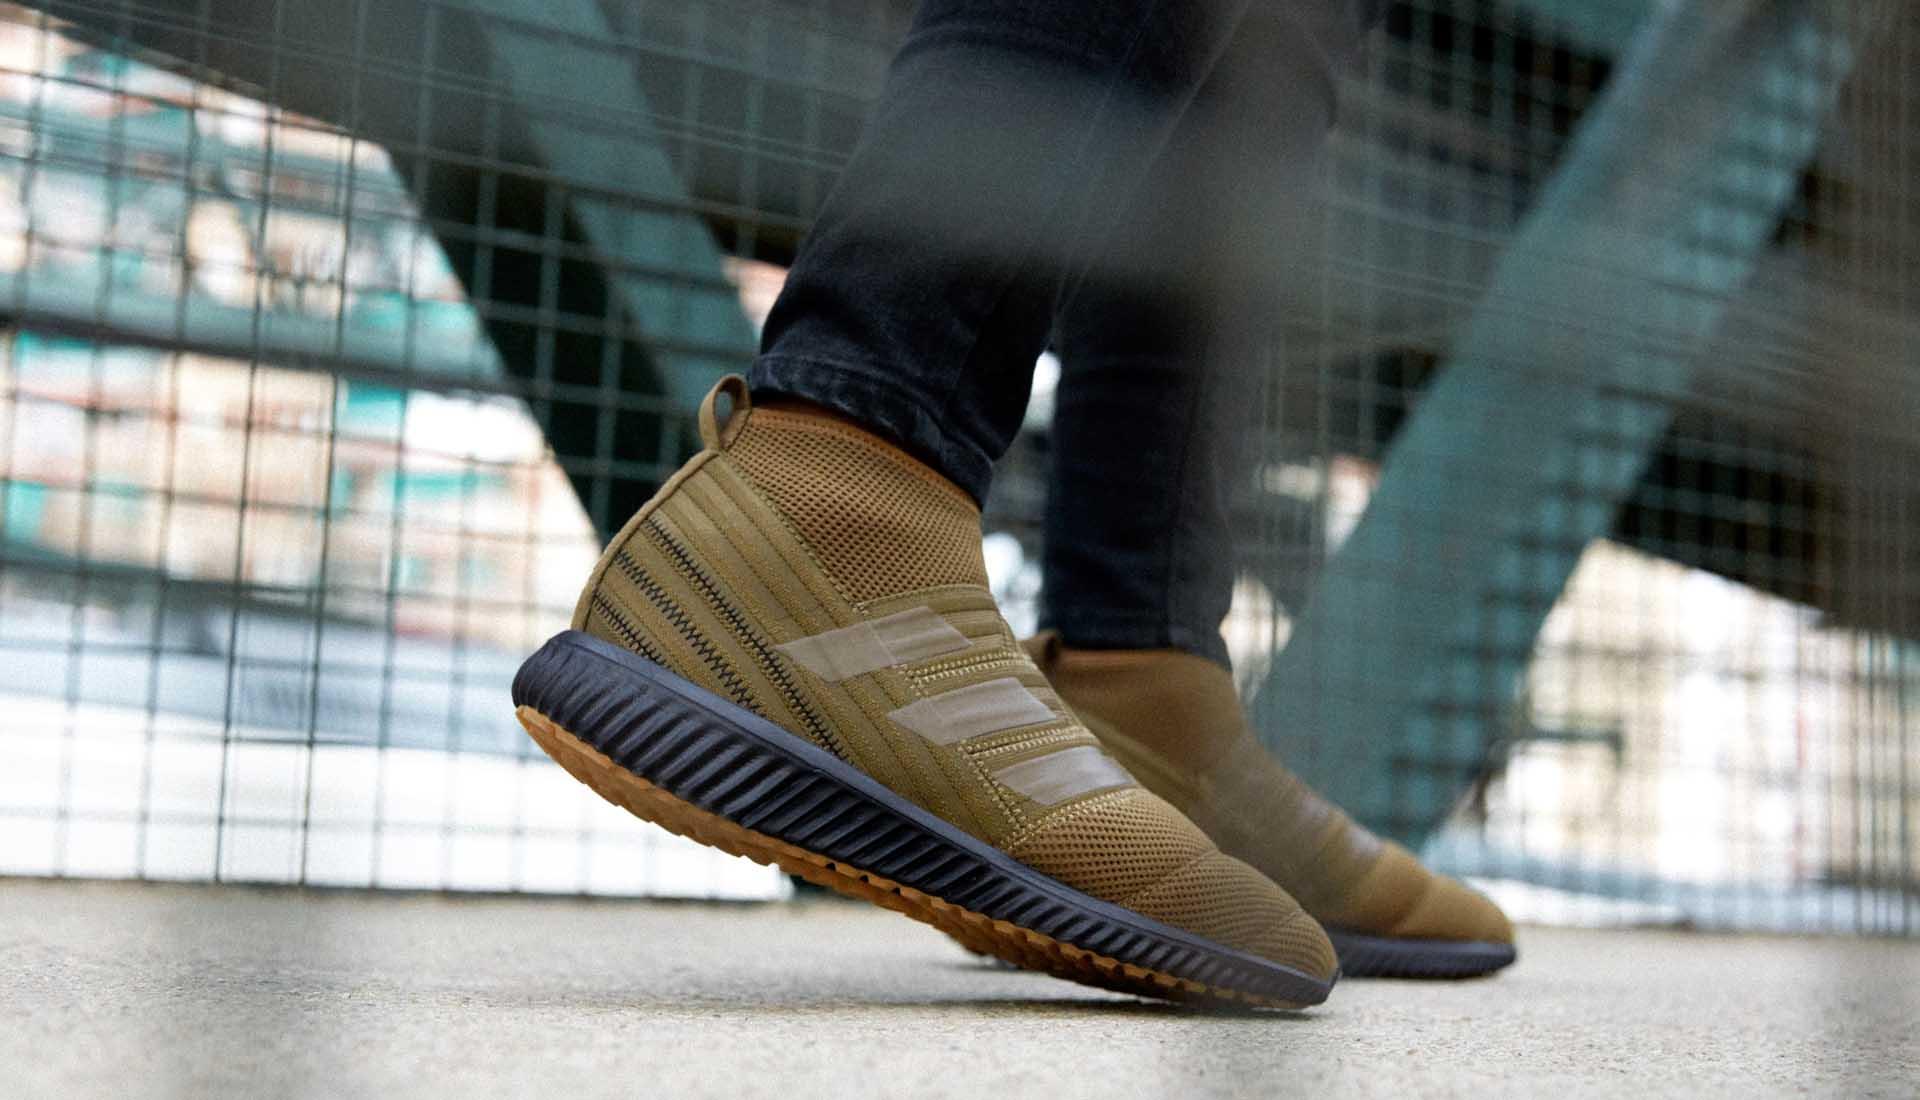 fd3f26343294 adidas Football Launch The Nemeziz TR Mid-Cut Sneakers - SoccerBible